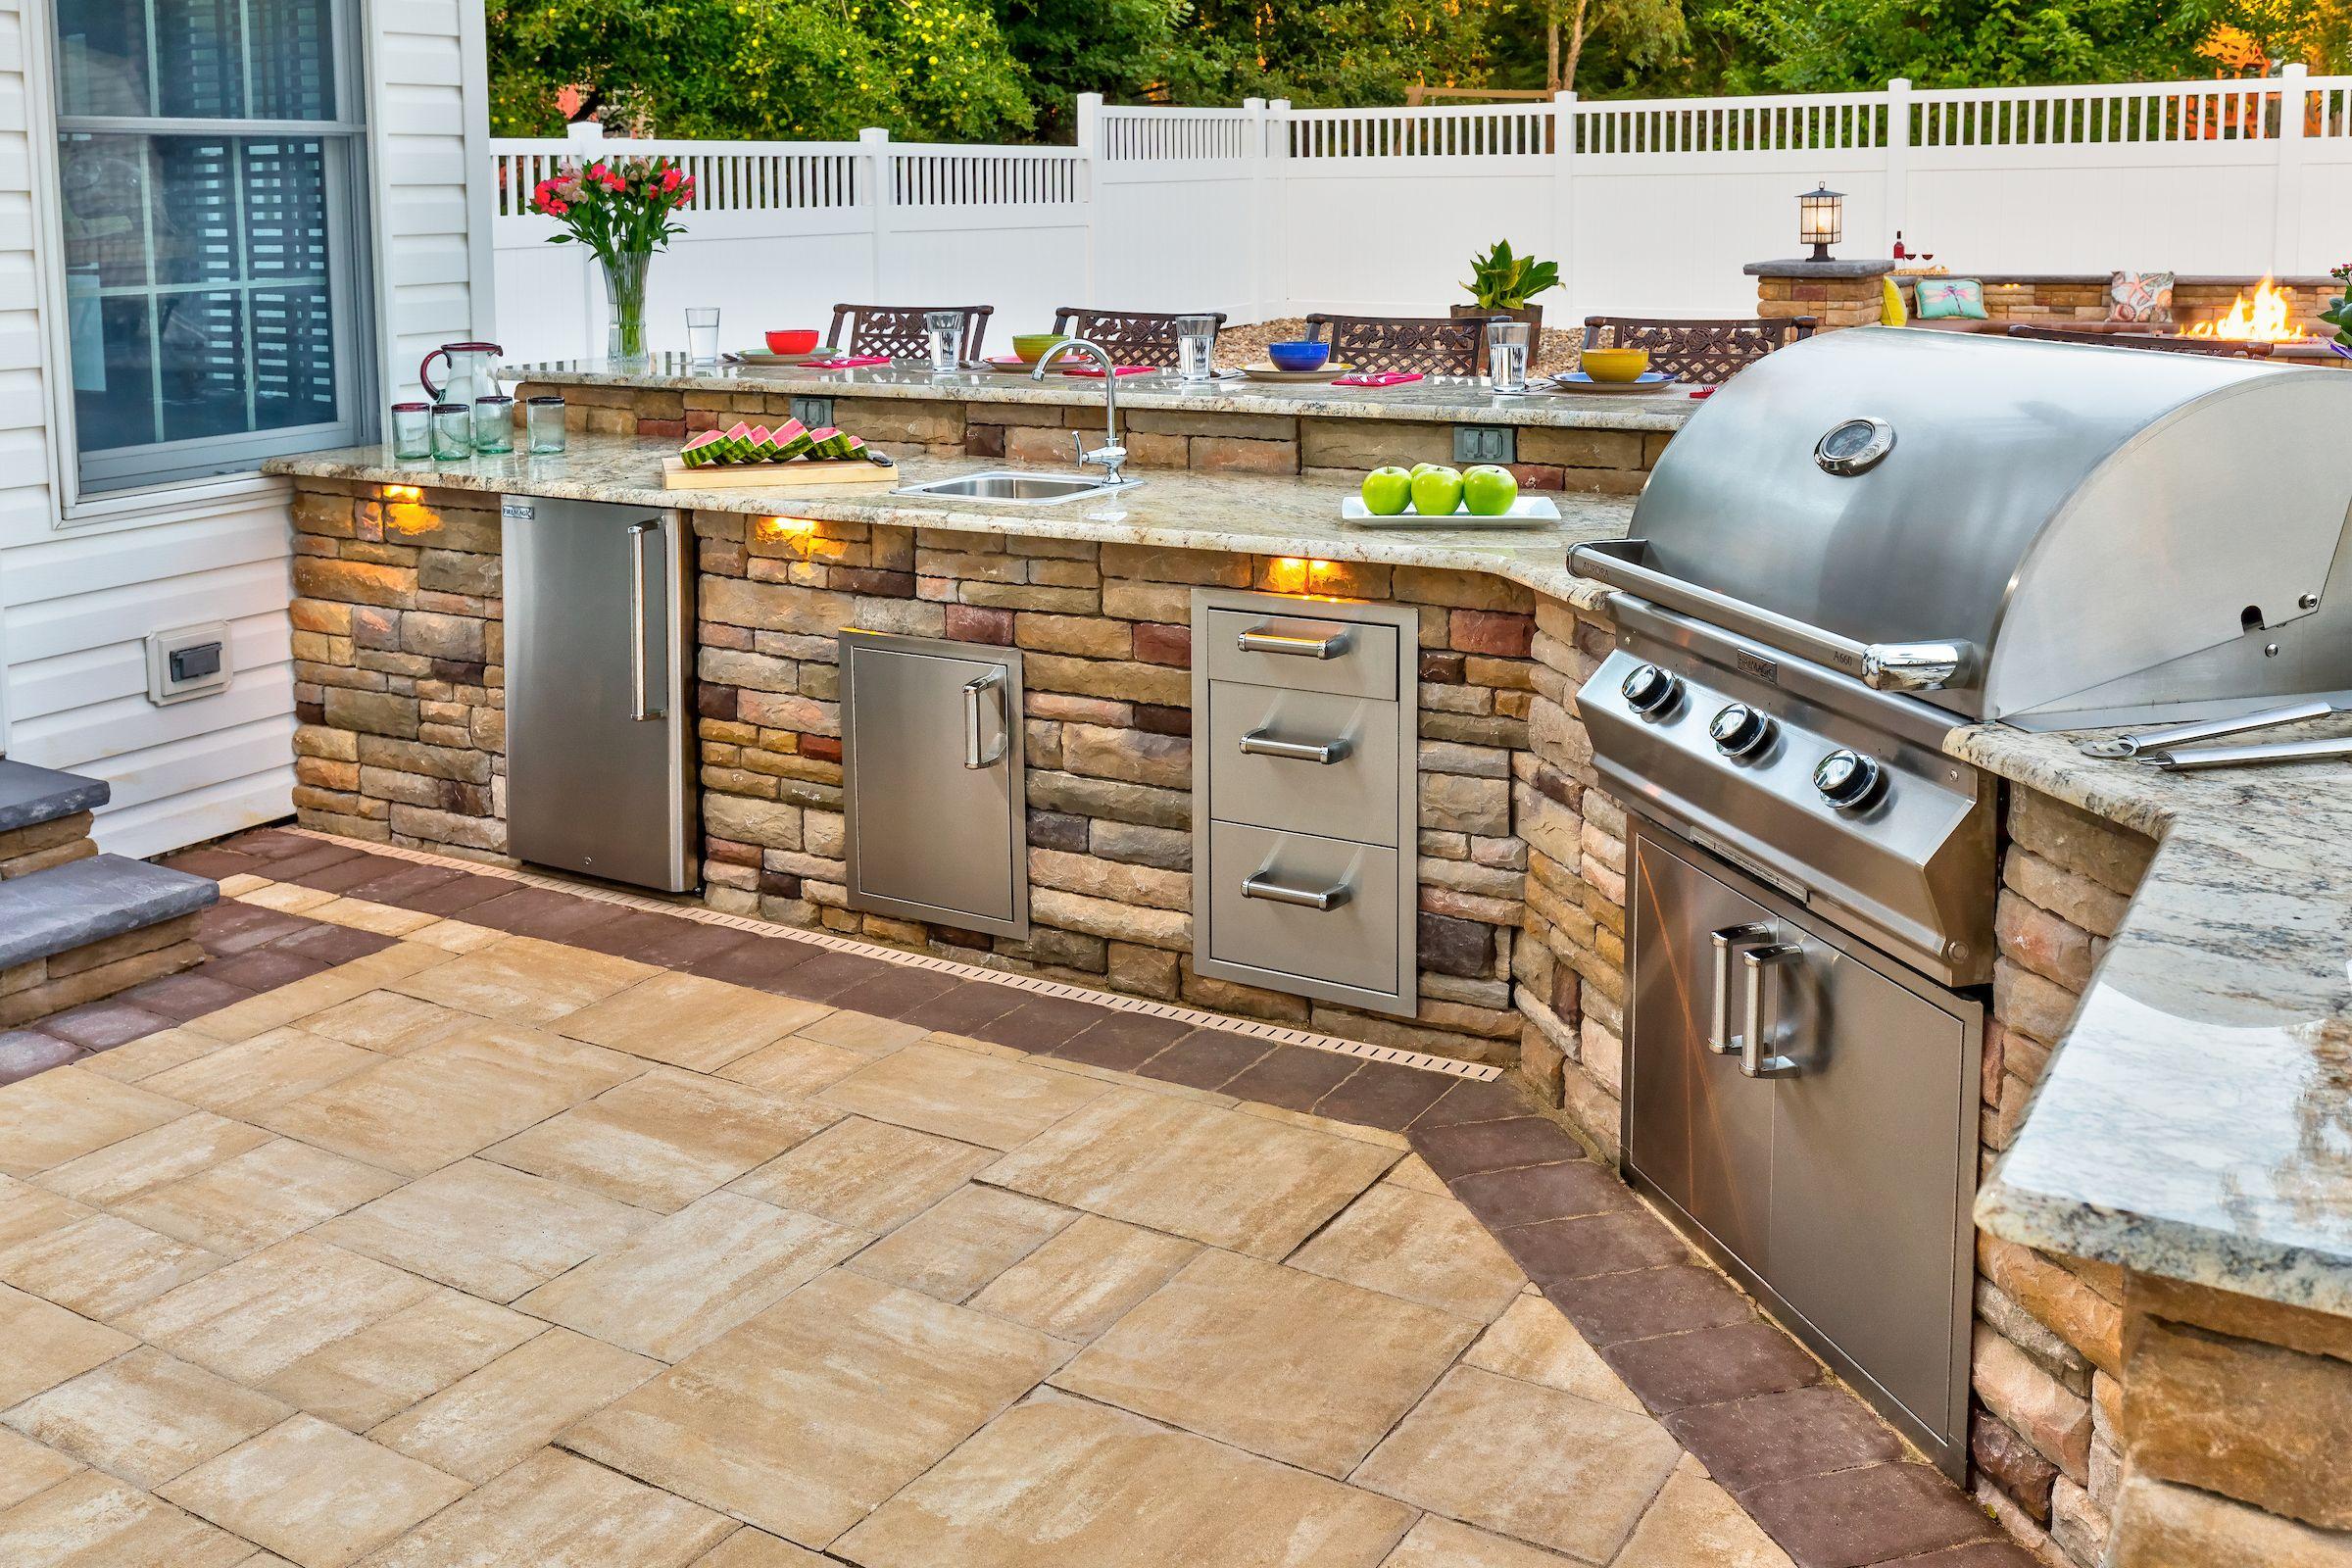 Eph Hoover 03 Outdoor Kitchen Design Outdoor Kitchen Outdoor Kitchen Design Layout